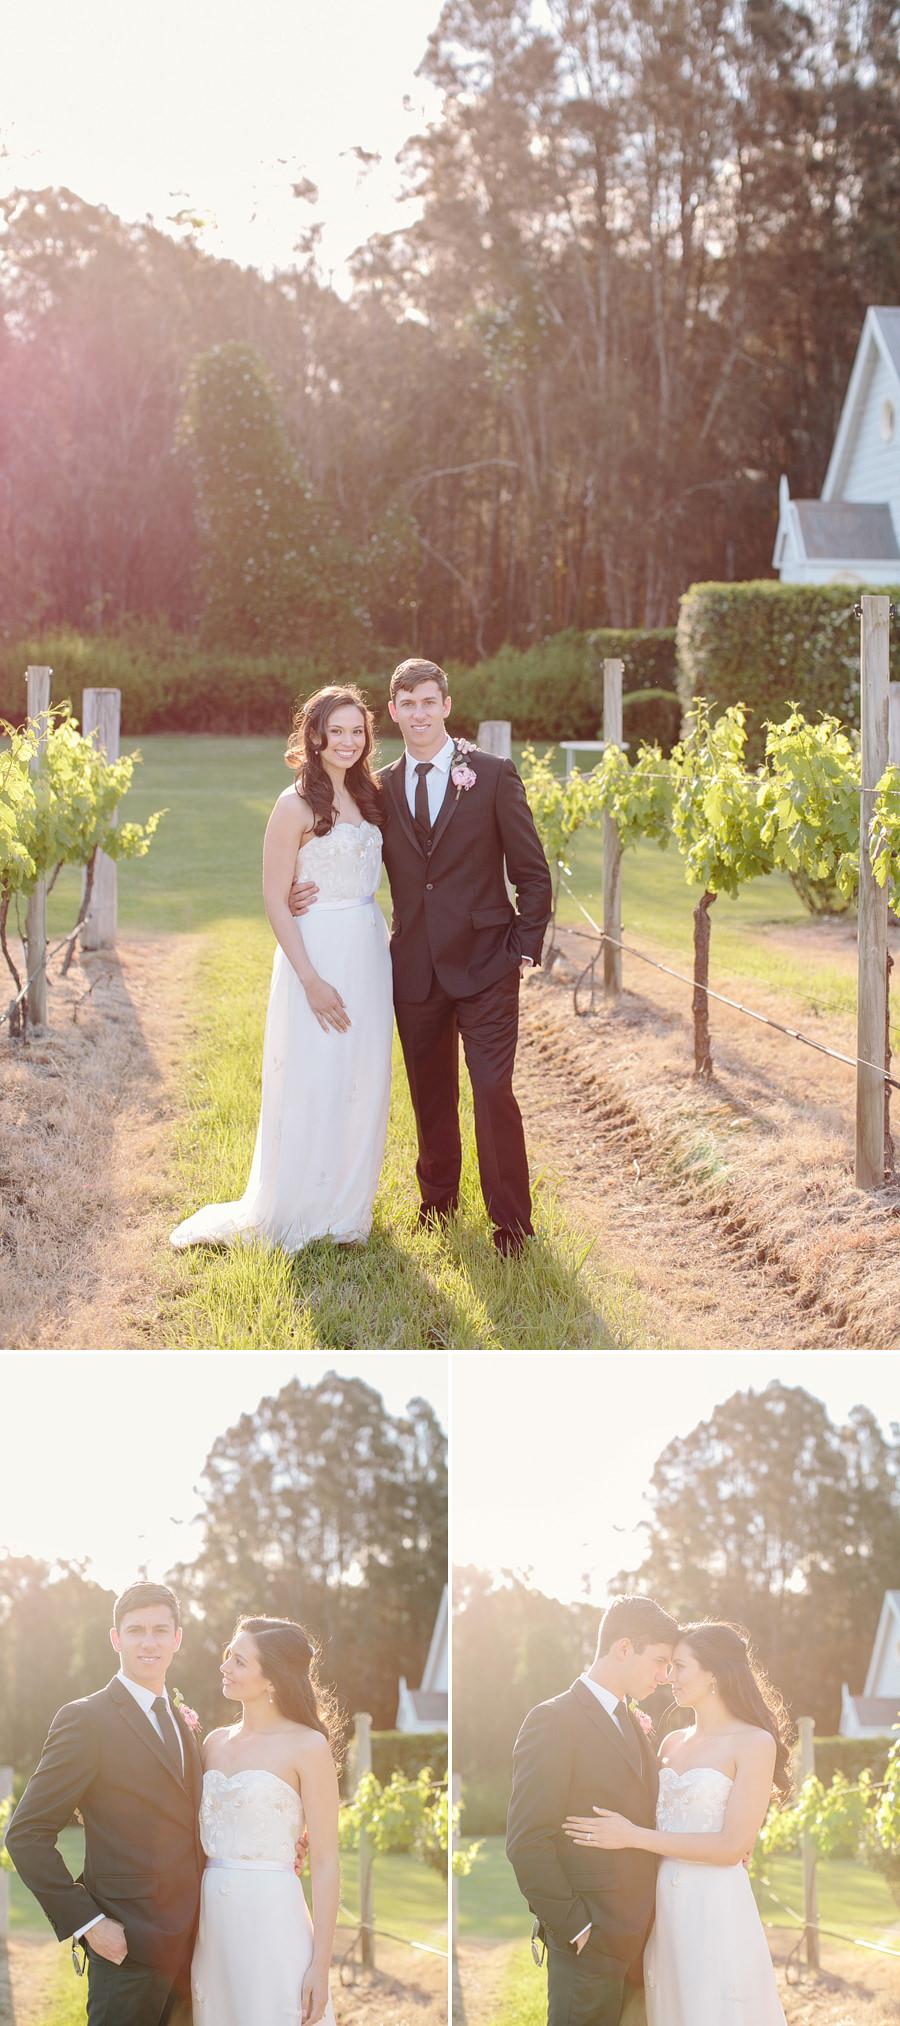 Pokolbin Wedding Photography: Vineyard portraits